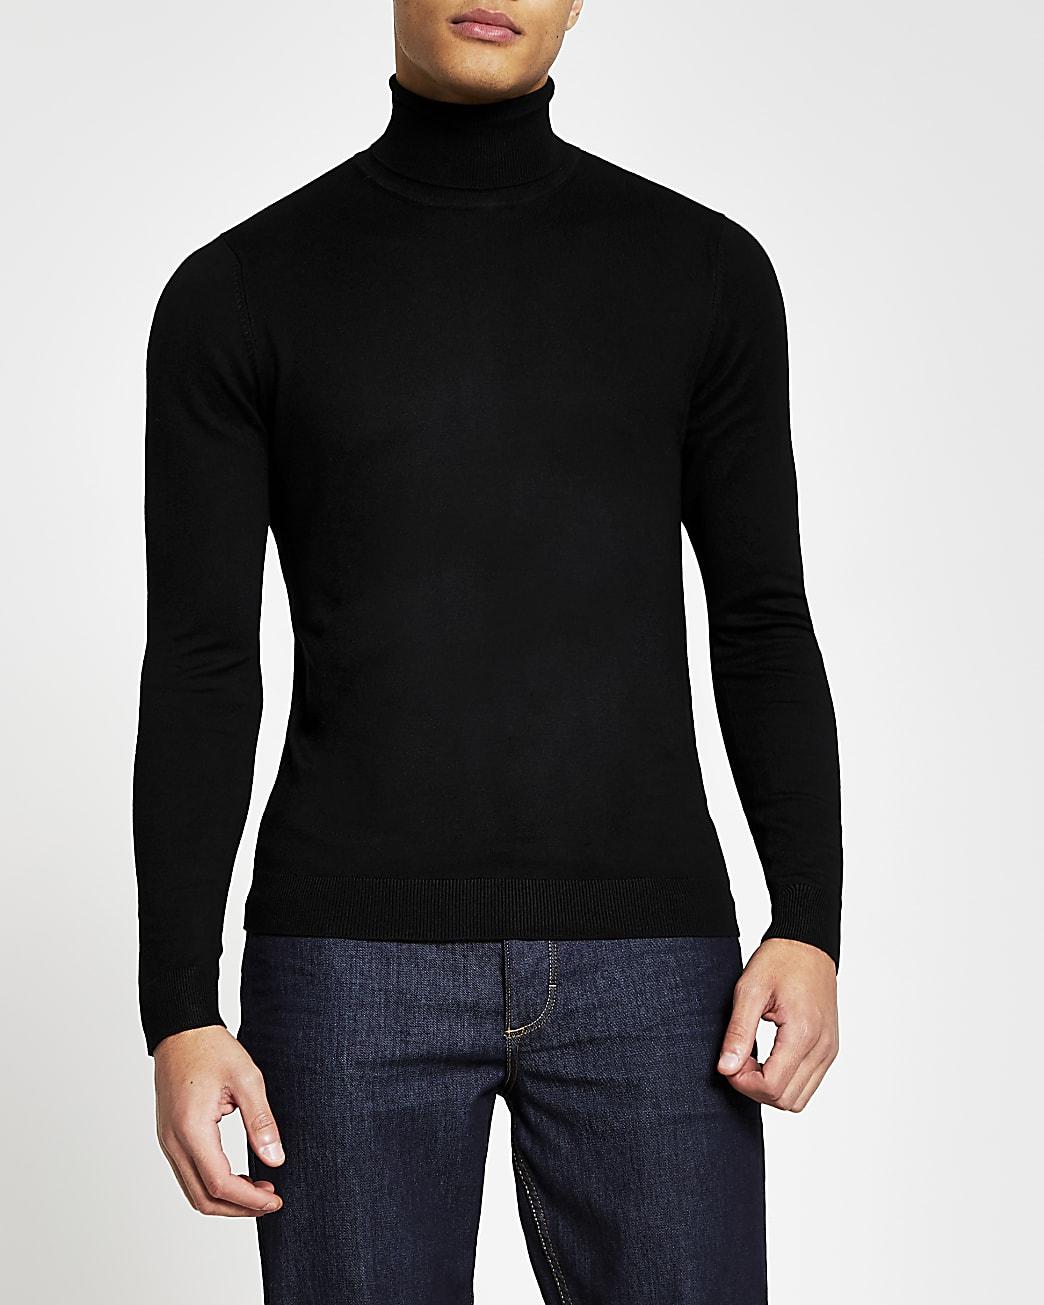 Black long sleeve roll neck jumper